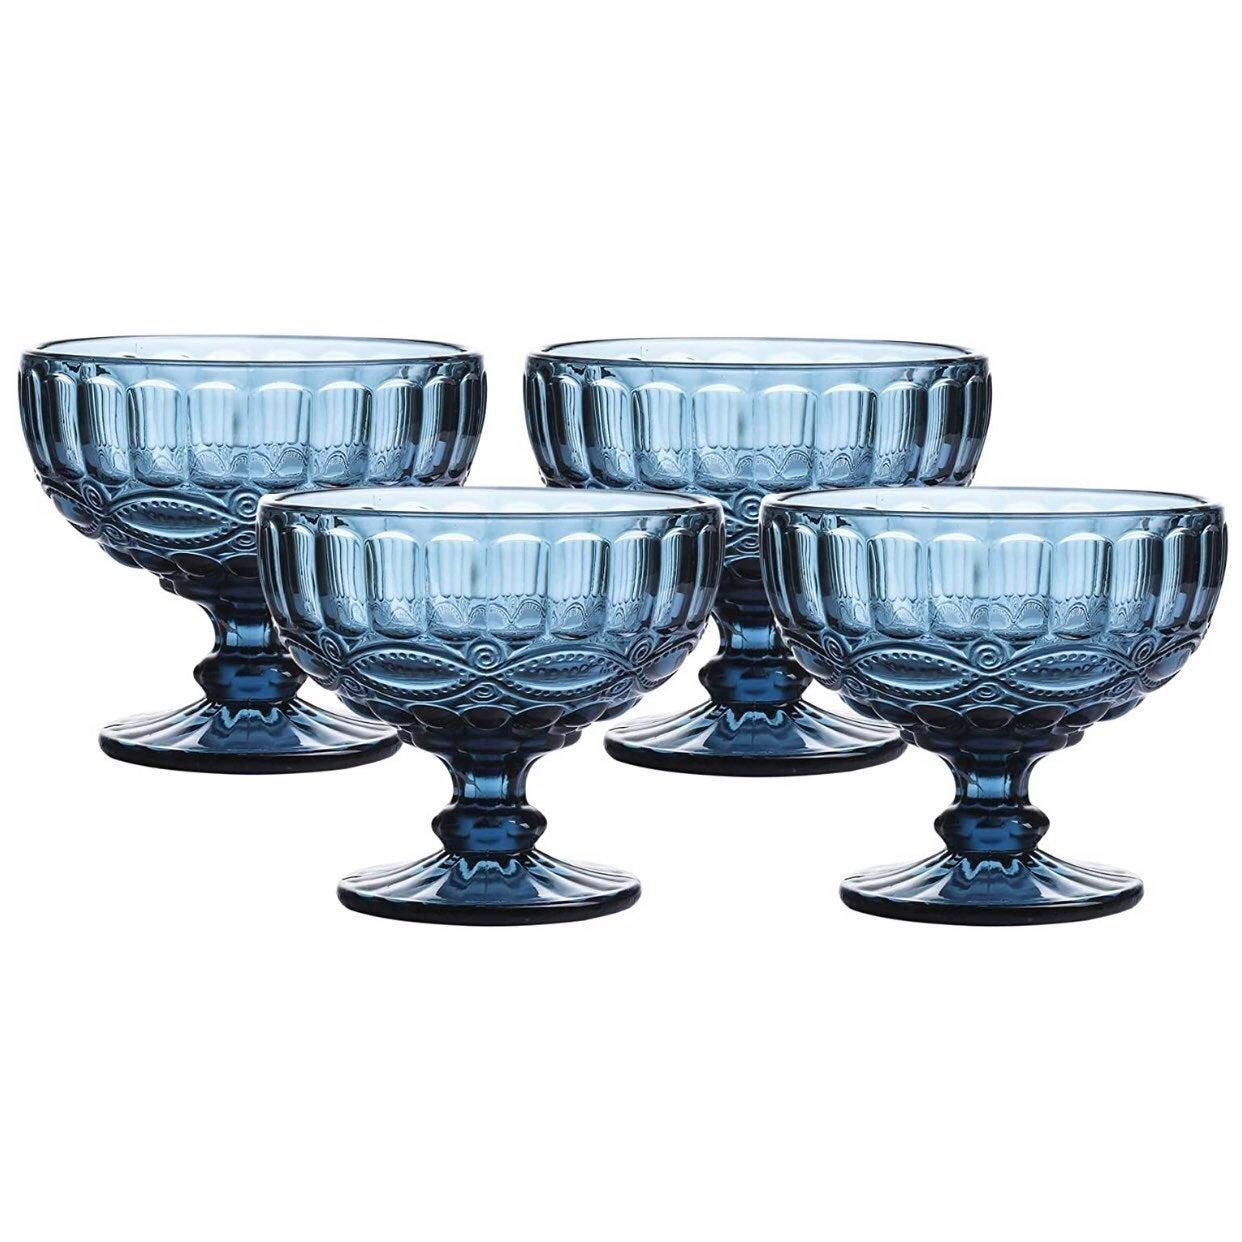 IceCream Cup Dessert Bowl Cocktail Glass